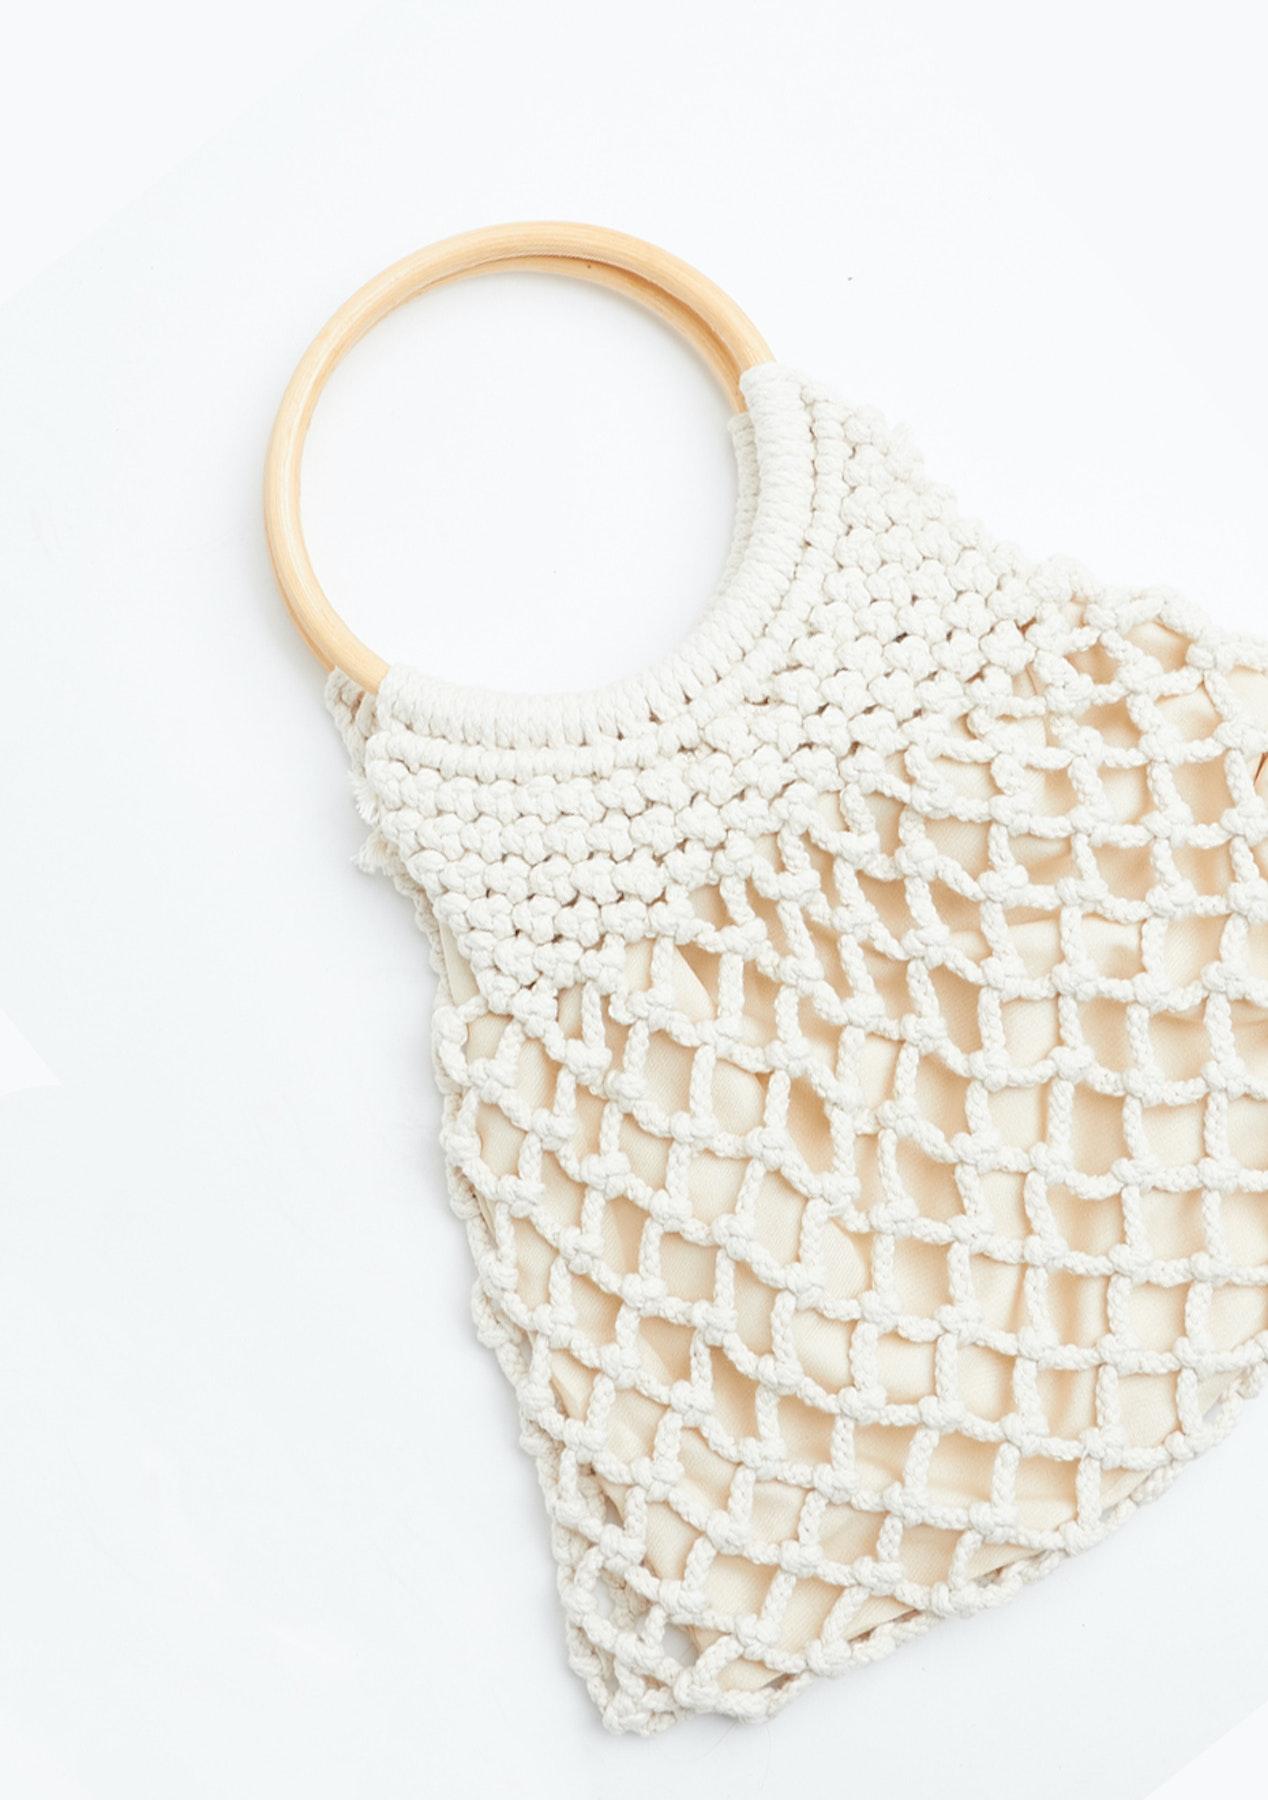 Circular Wooden Handle Net Handbag White